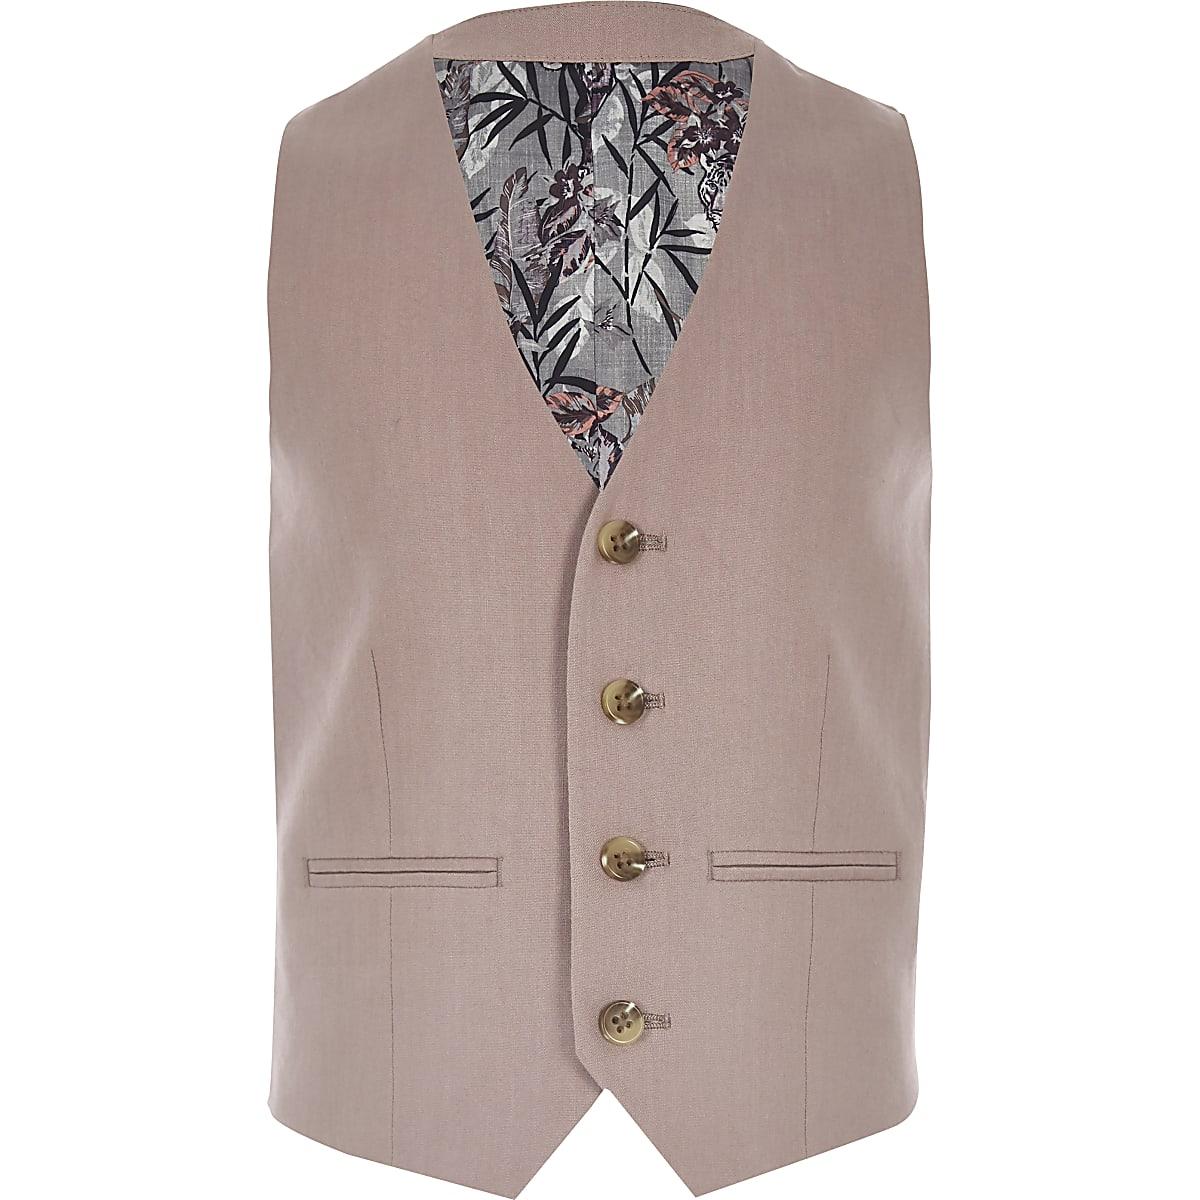 67ce0210da9b5 Boys pink linen suit waistcoat - Waistcoats - Suits - boys